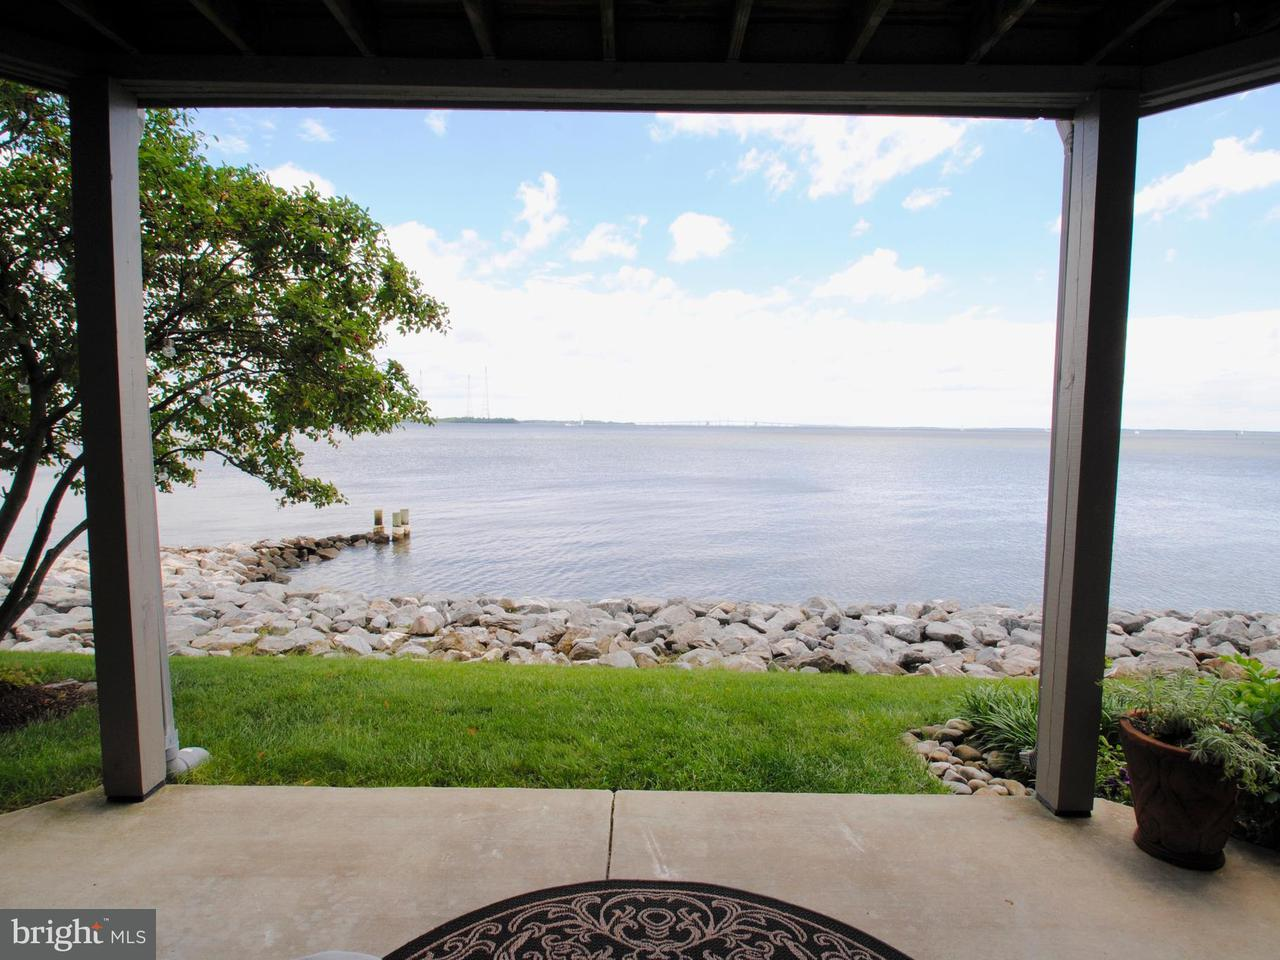 Condominium for Sale at 2022 QUAY VILLAGE CT #T-2 2022 QUAY VILLAGE CT #T-2 Annapolis, Maryland 21403 United States